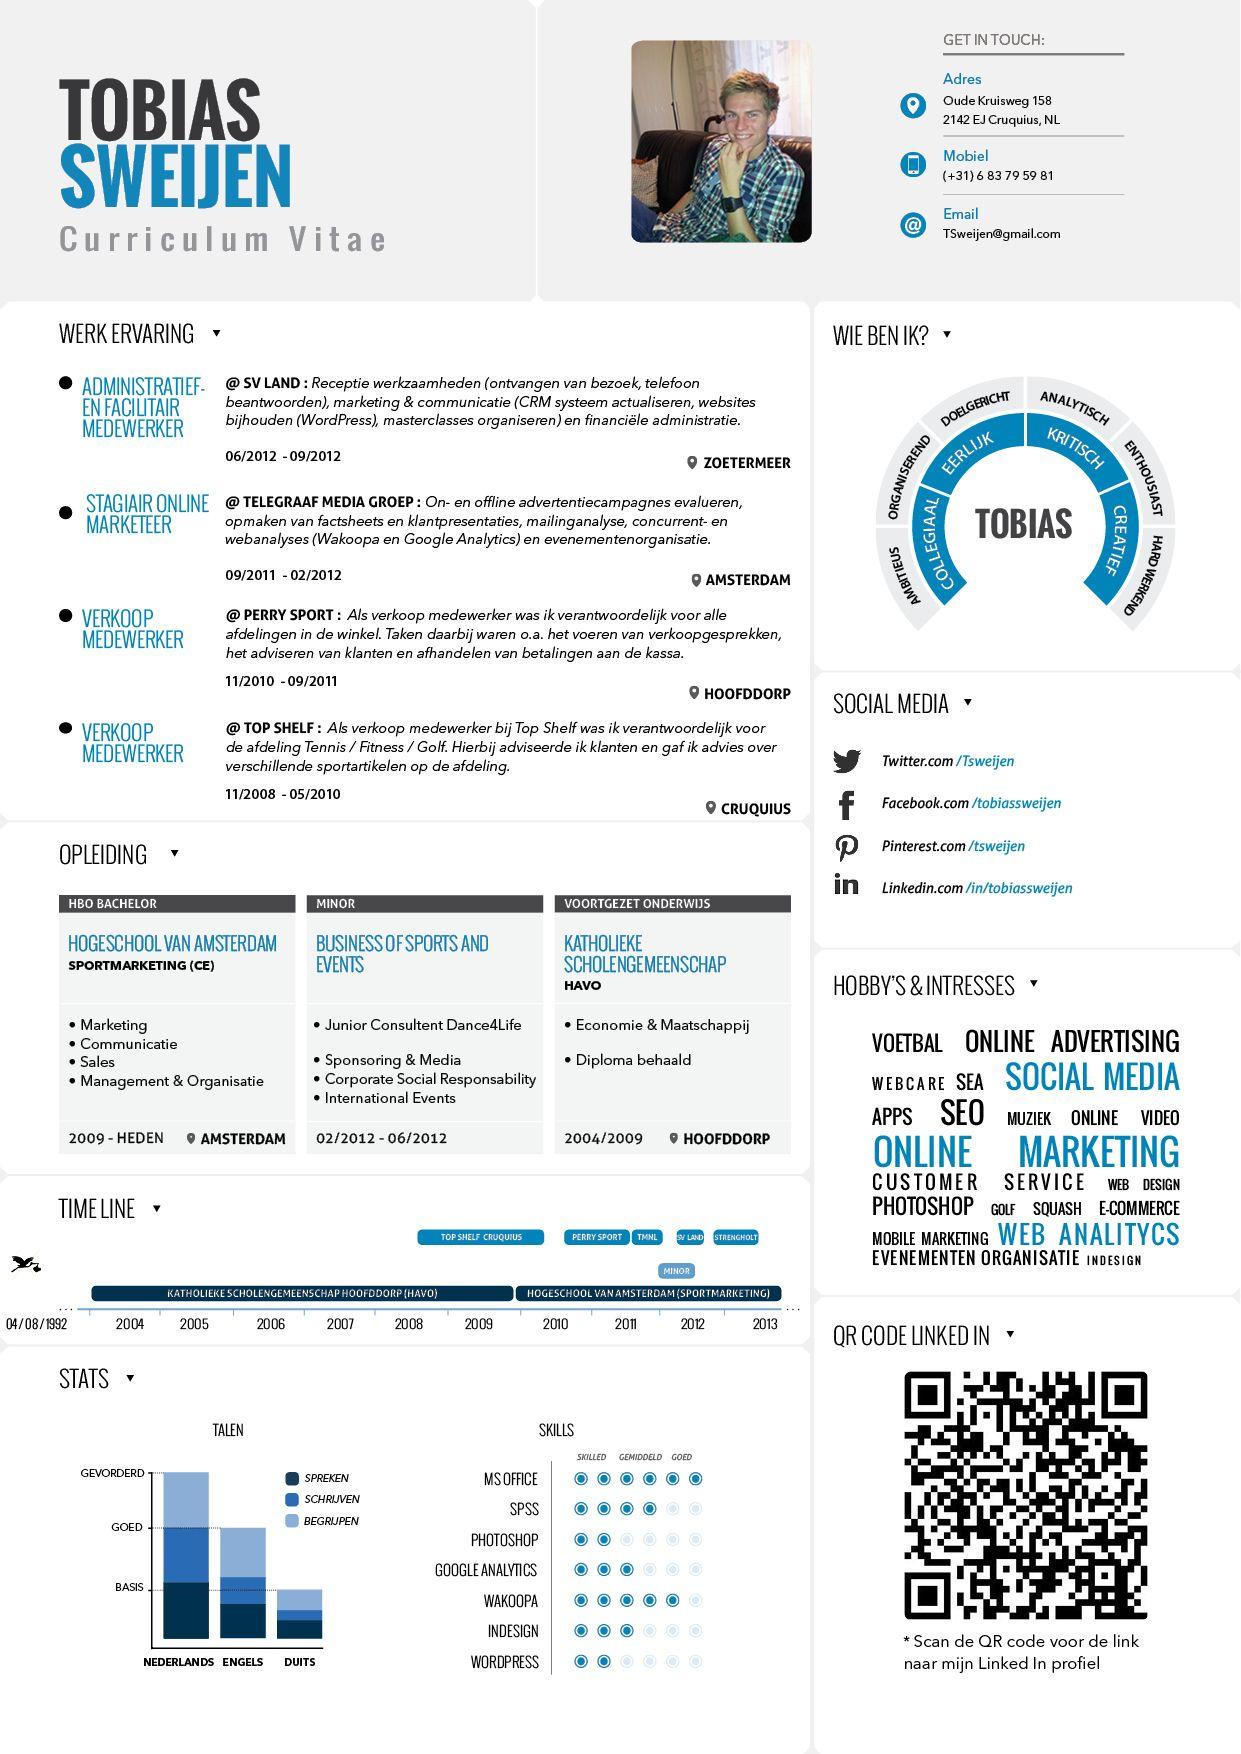 Pin By Hum Chai On Favorite Places Spaces Curriculum Vitae Resume Infographic Resume Curriculum Vitae